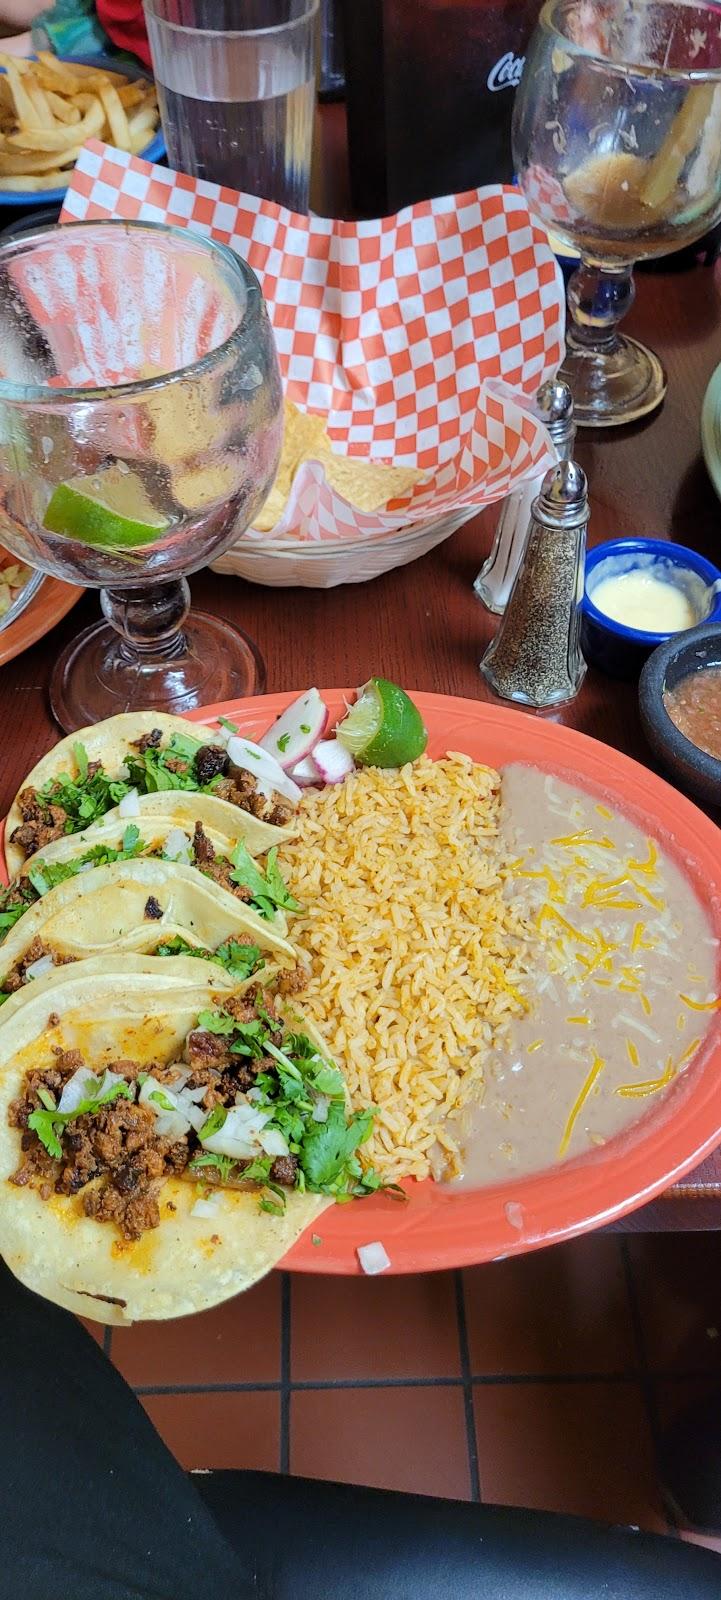 Tacos Los Primos   restaurant   2000 N Boomer Rd, Stillwater, OK 74075, USA   4053722510 OR +1 405-372-2510